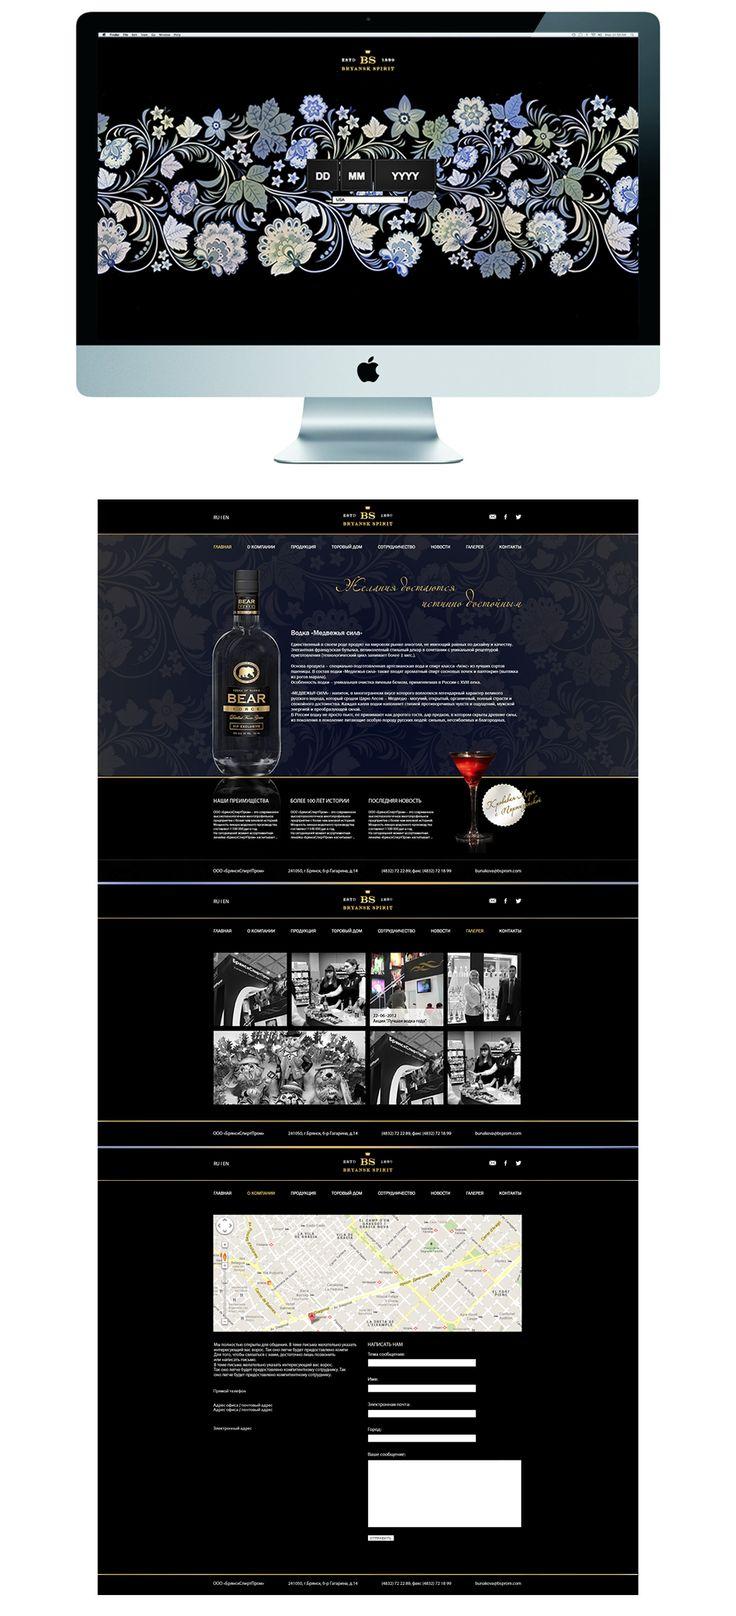 Концепт сайта завода БрянскСпиртПром – Разработка концепта сайта для ликеро-водочного завода «БрянскСпиртПром»